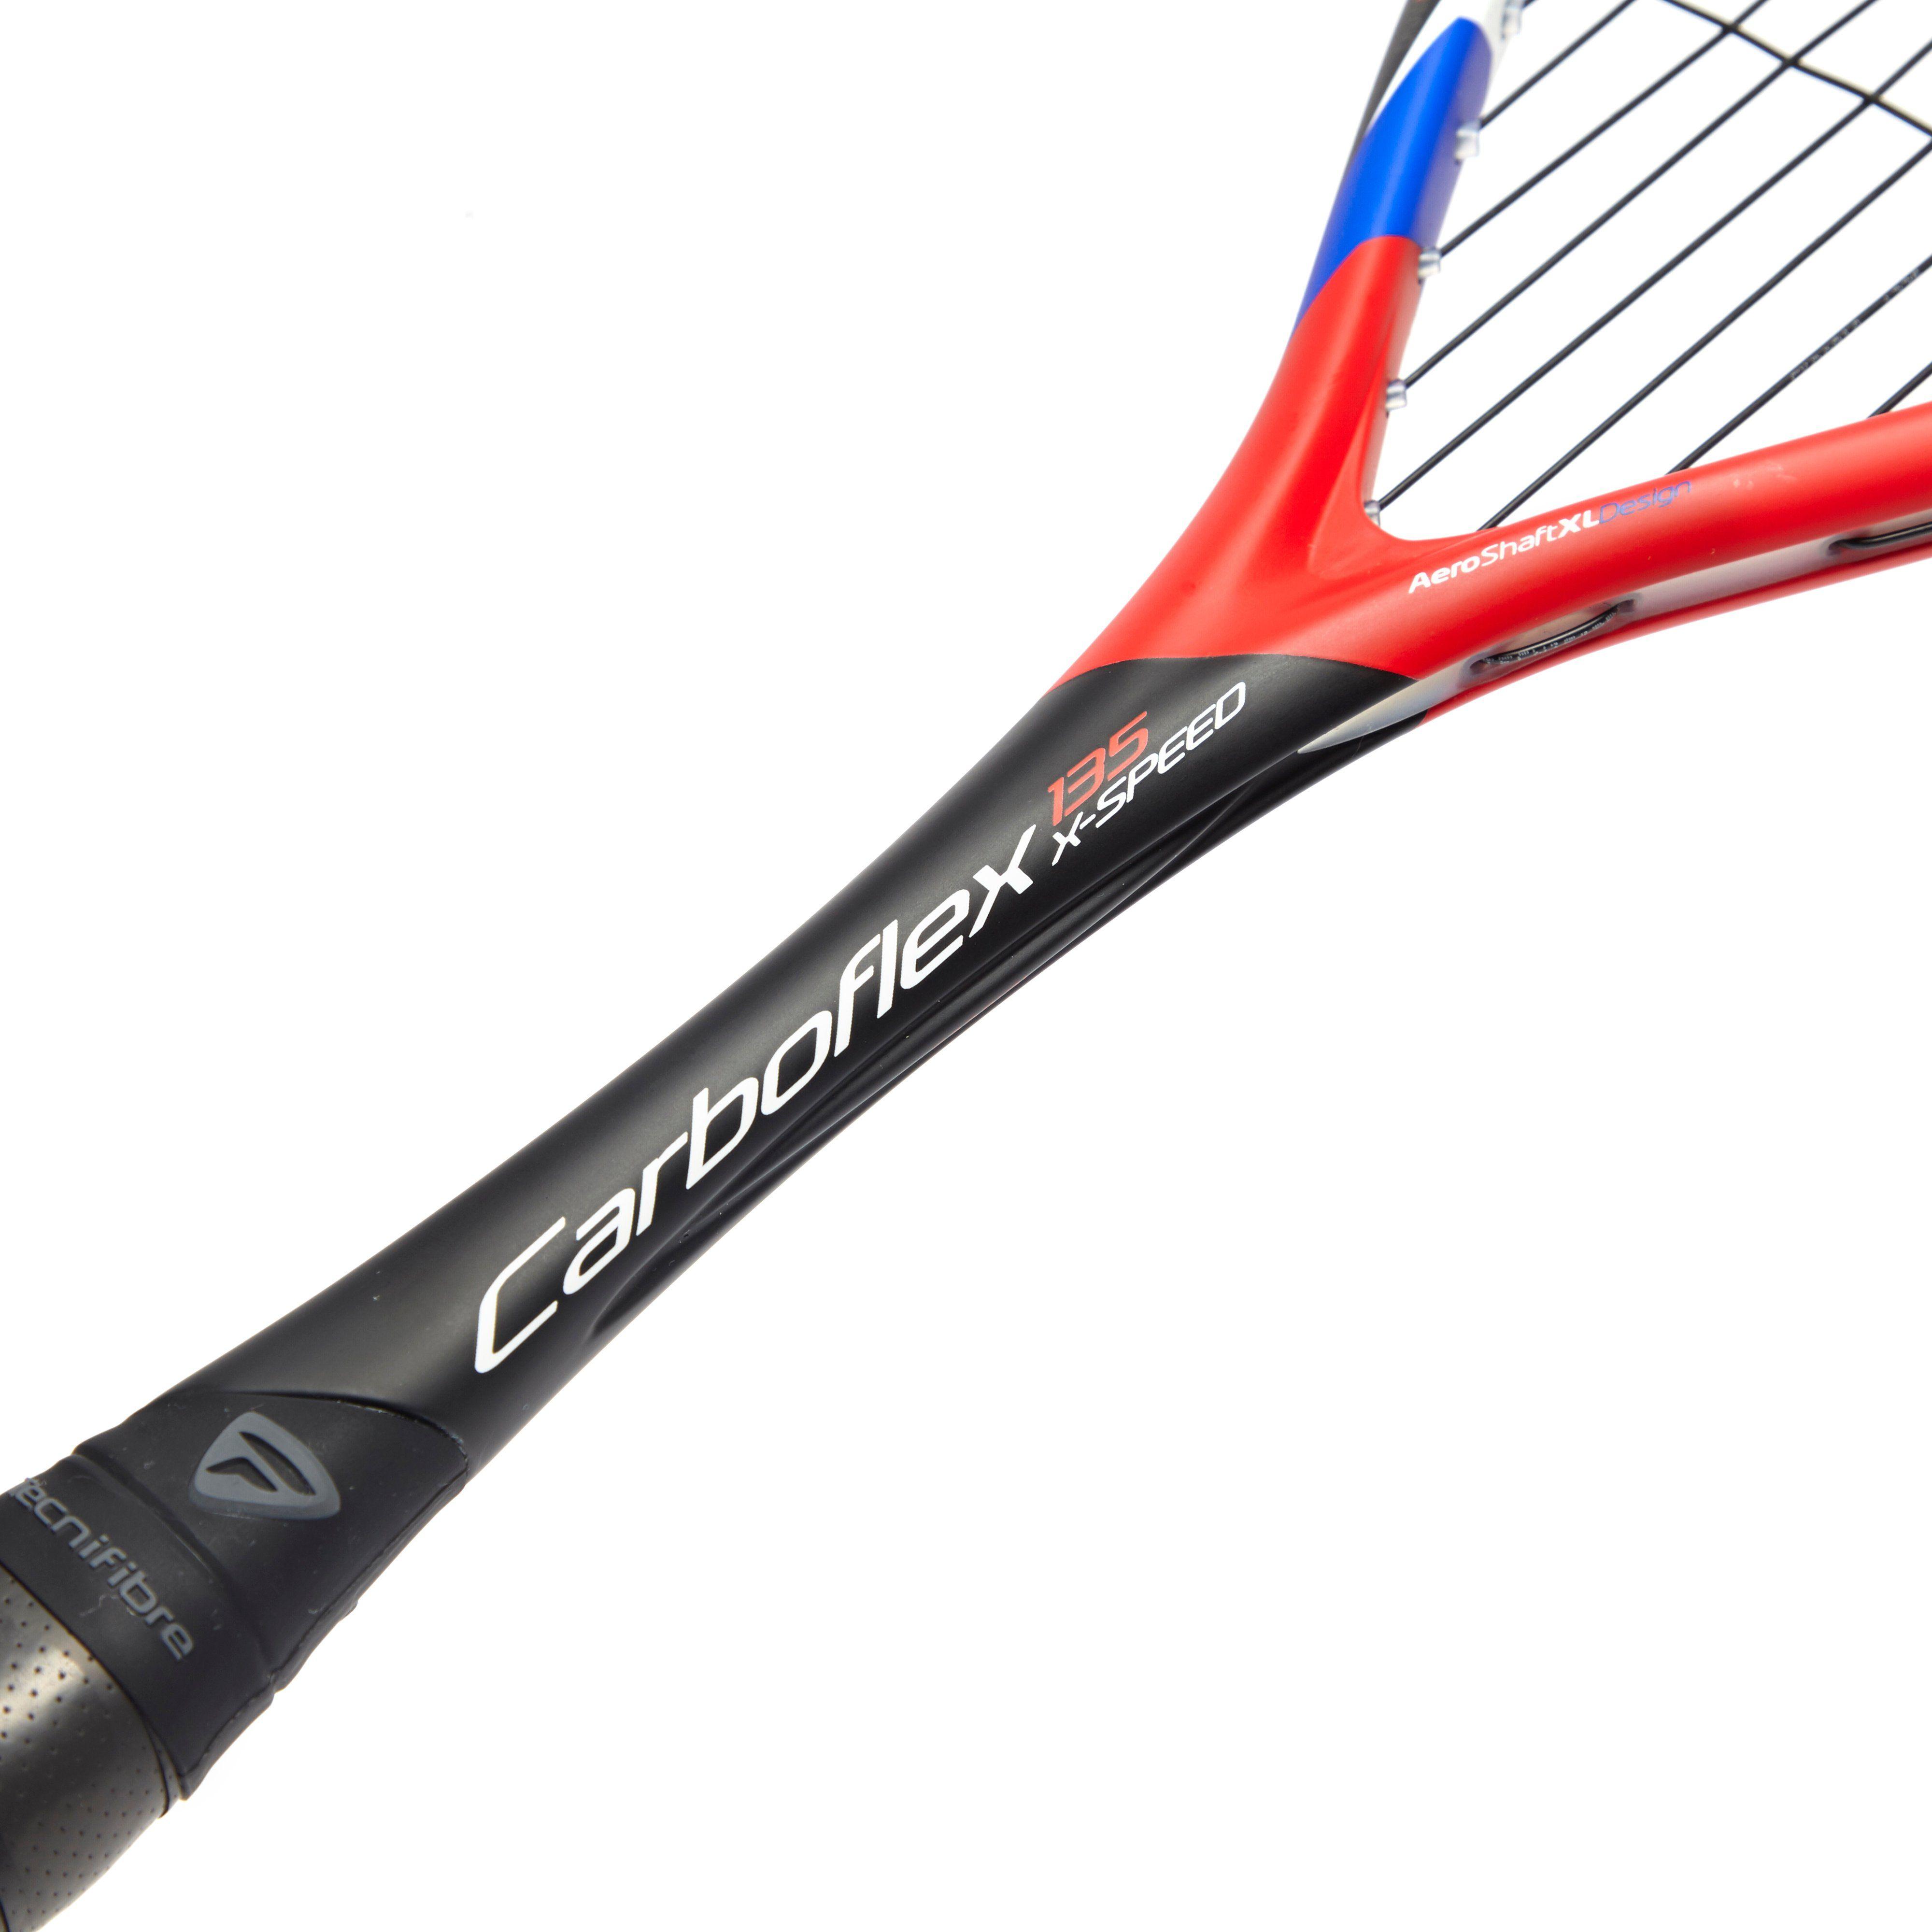 Tecnifibre Carboflex 135 X-Speed Squash Racket